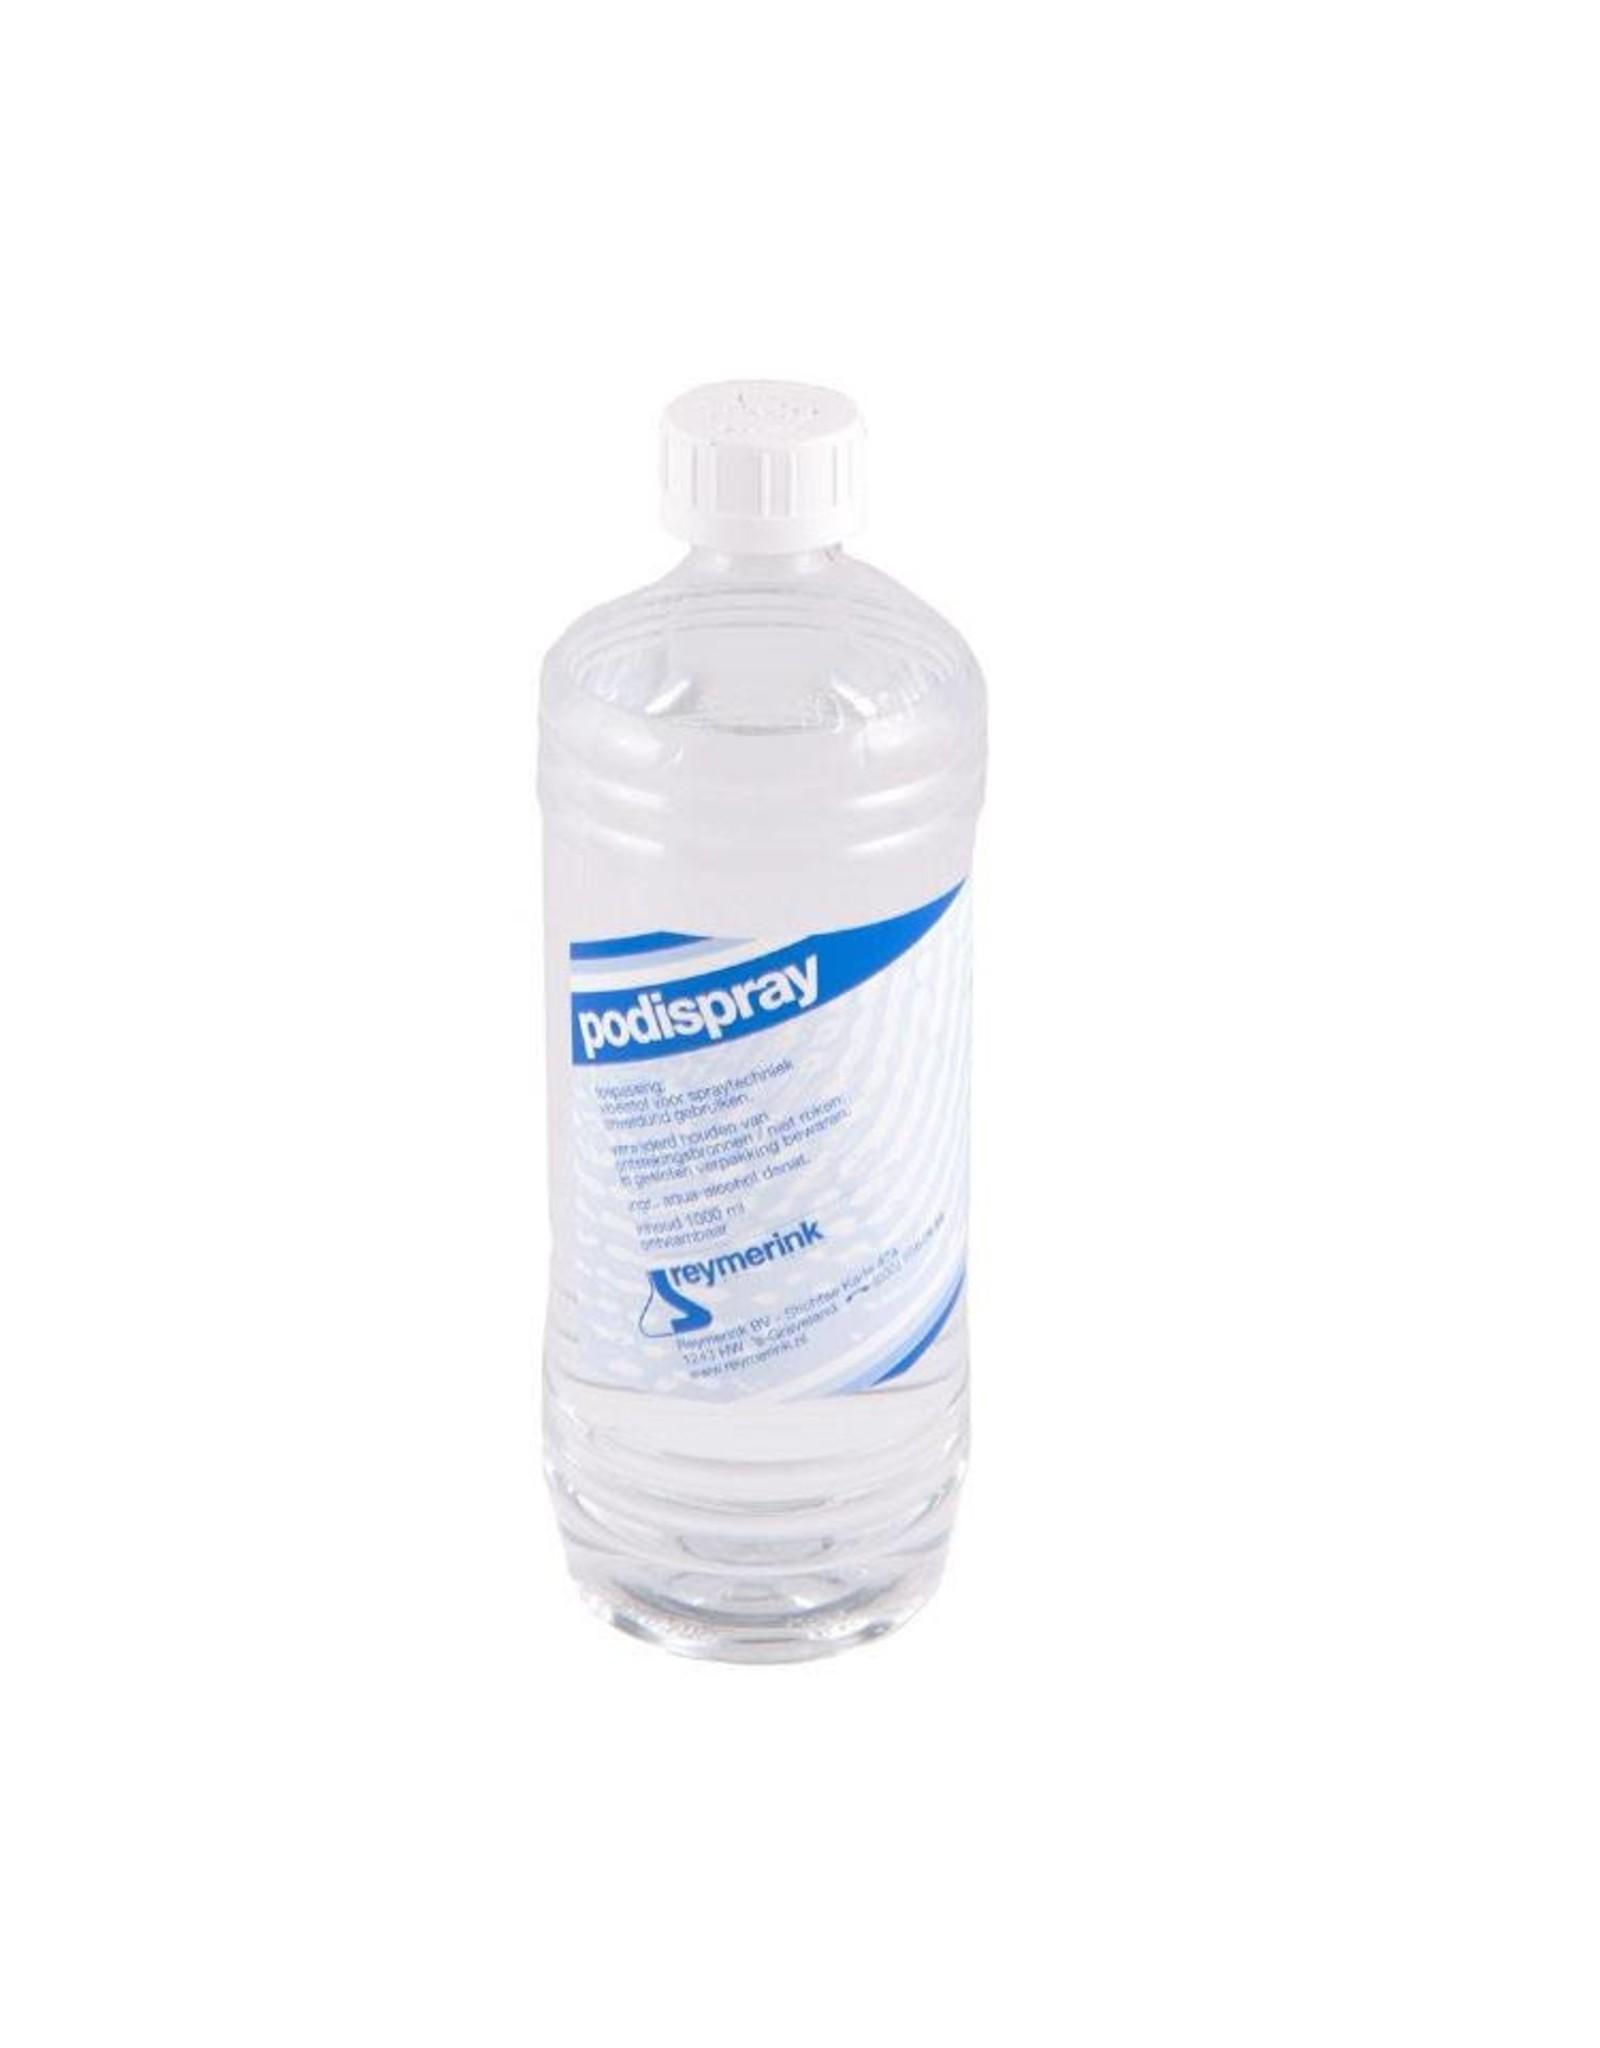 Reymerink Reymerink Podispray 1000 ml